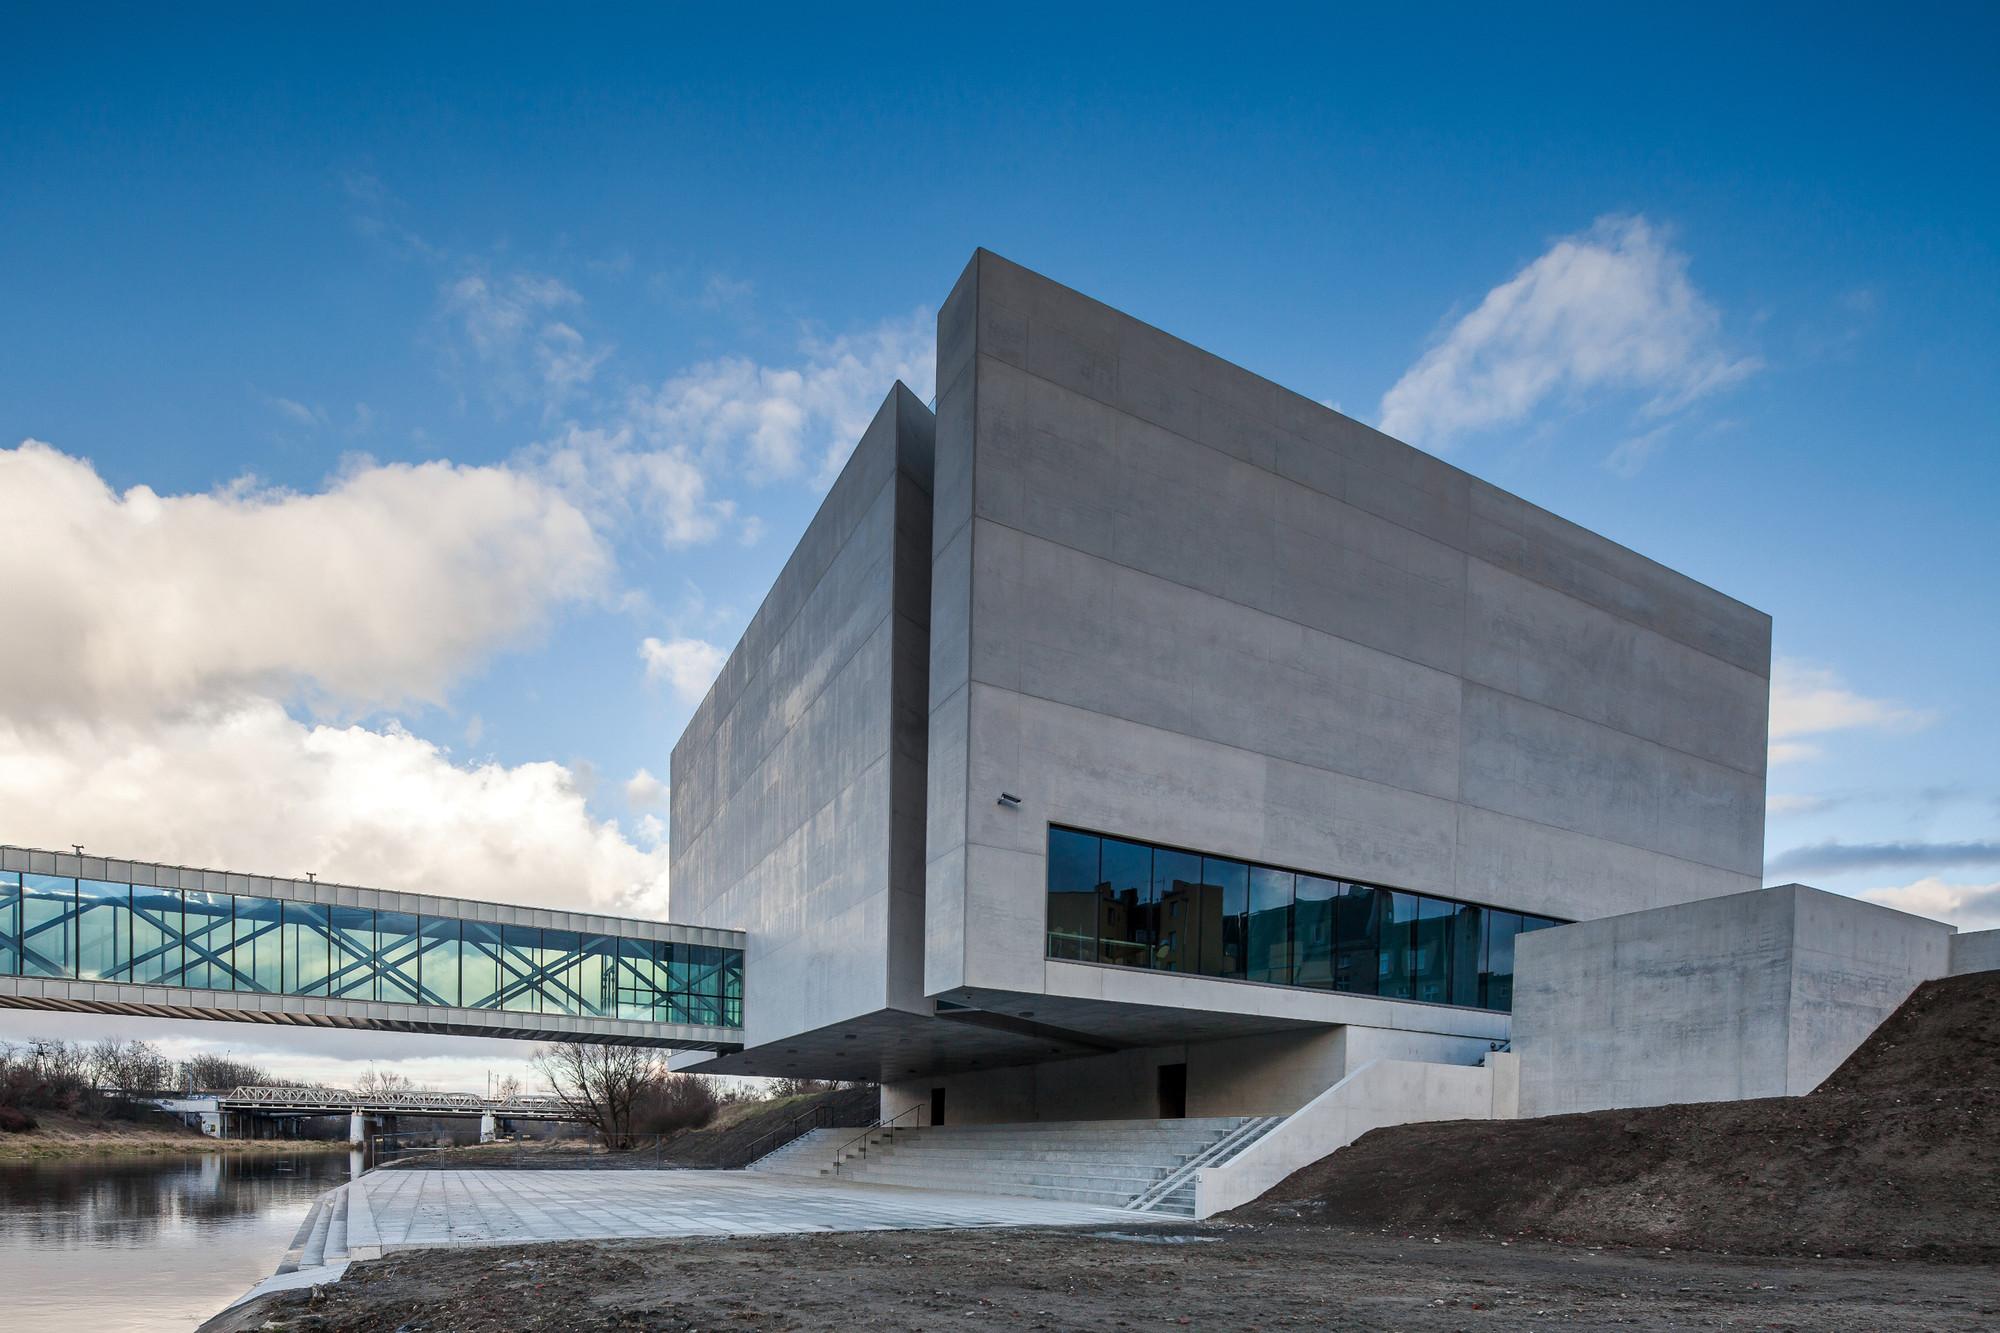 Ichot - Puerta de Poznan / Ad Artis Architects, © Mariusz Lis